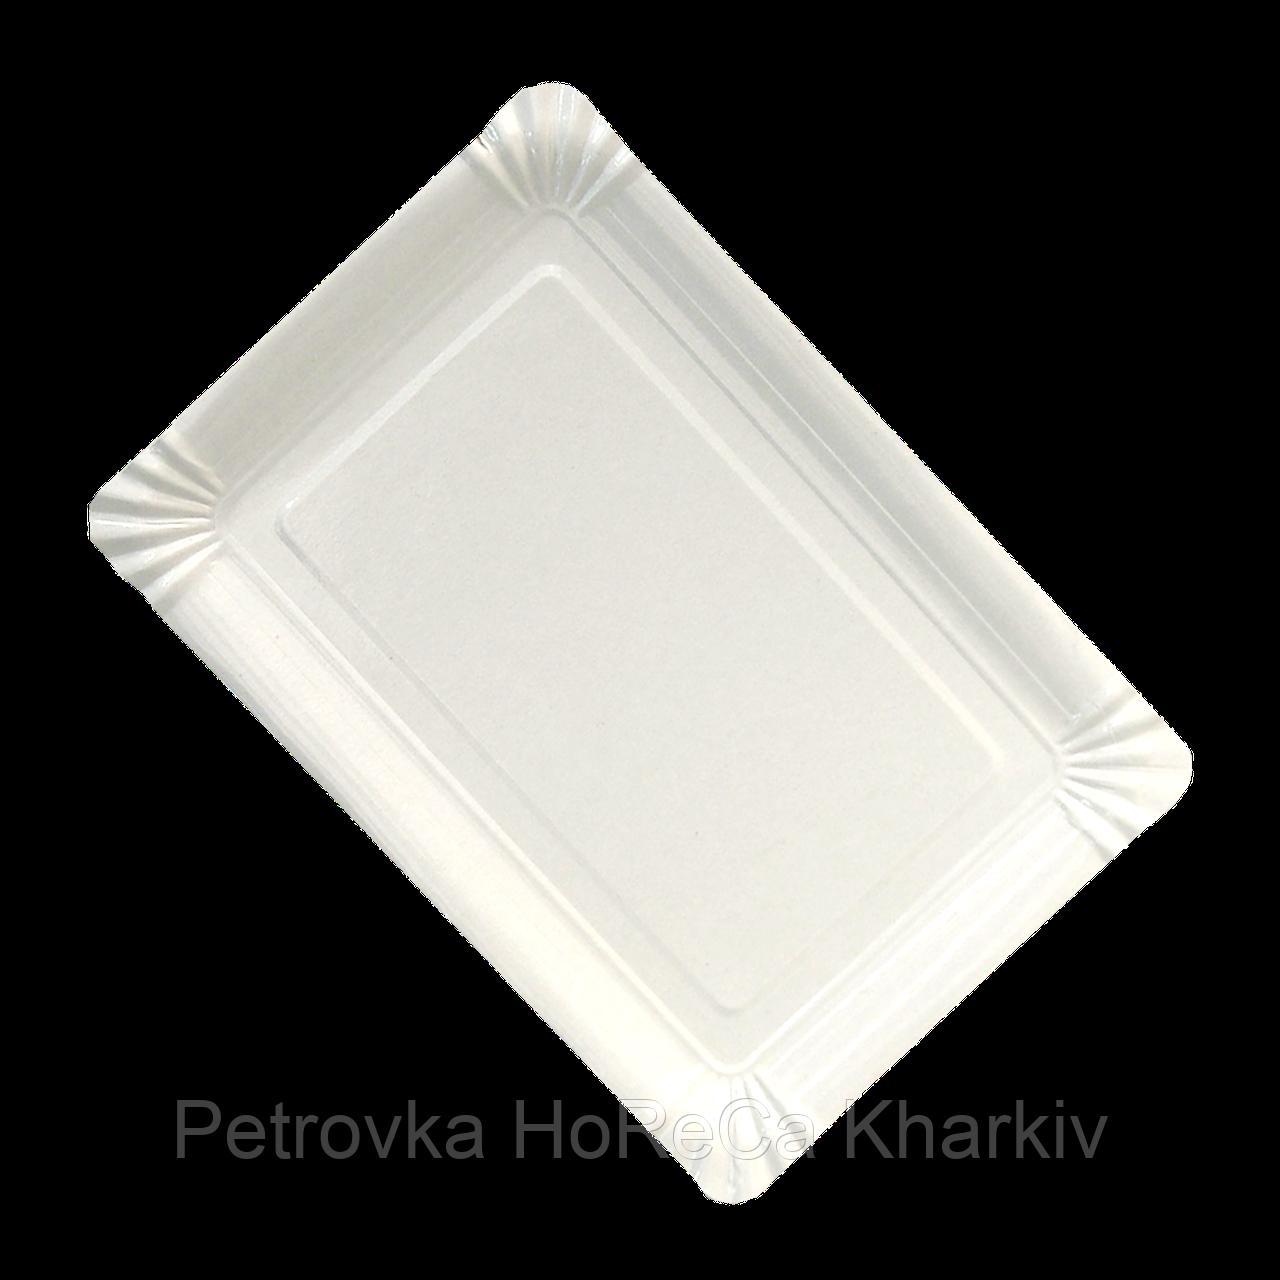 Тарелка картонная Белая ХТ15*22см 100шт/уп